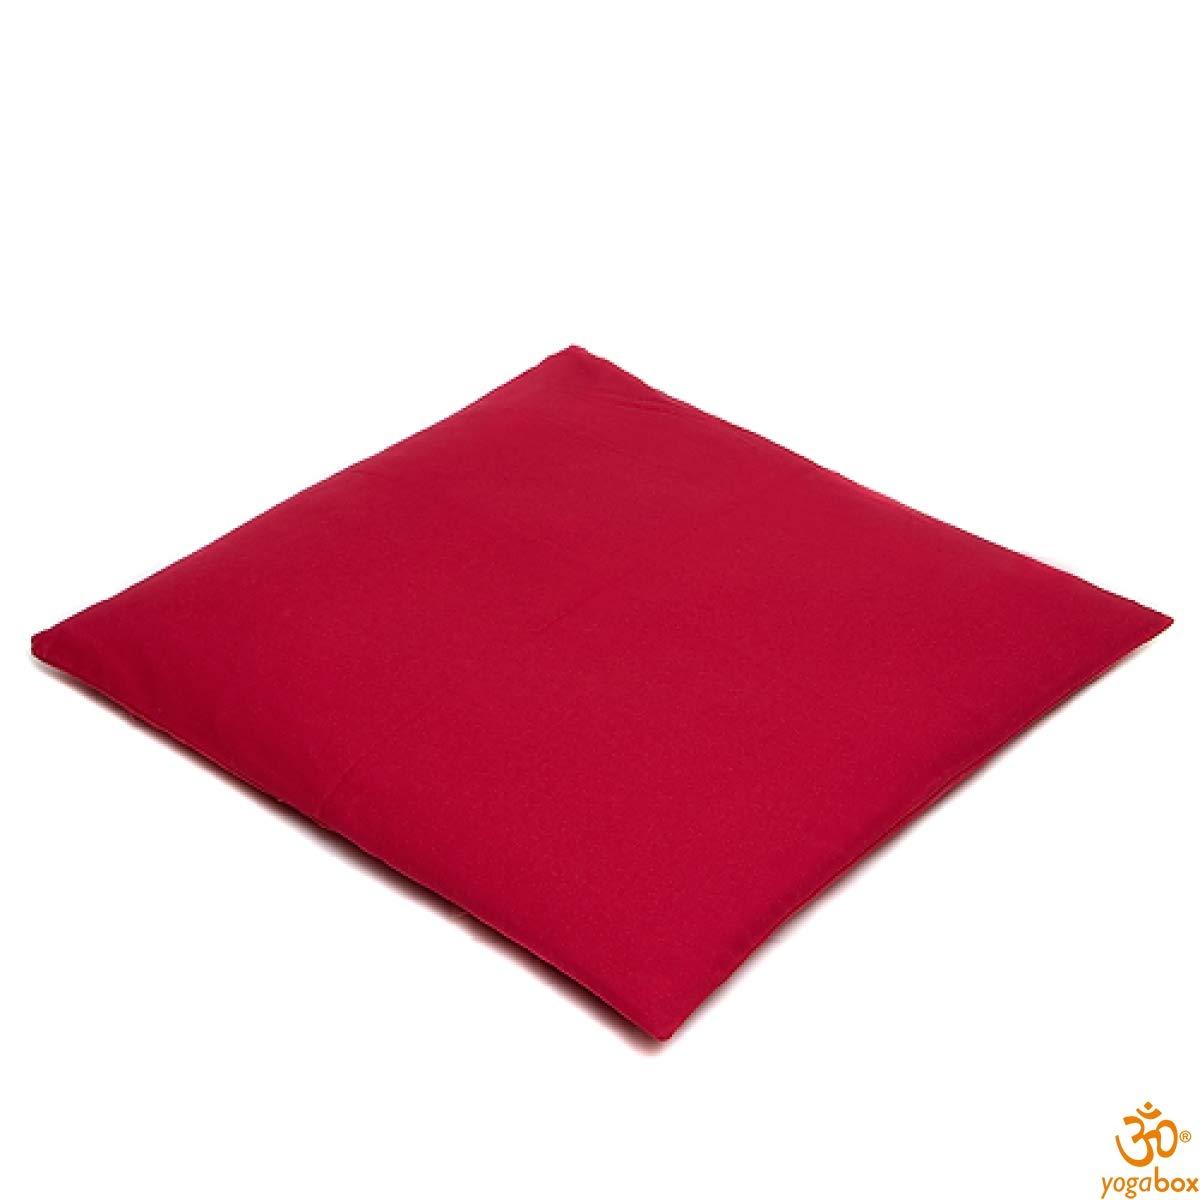 yogabox Zabuton 100x100 cm Made in Germany, Rojo: Amazon.es ...